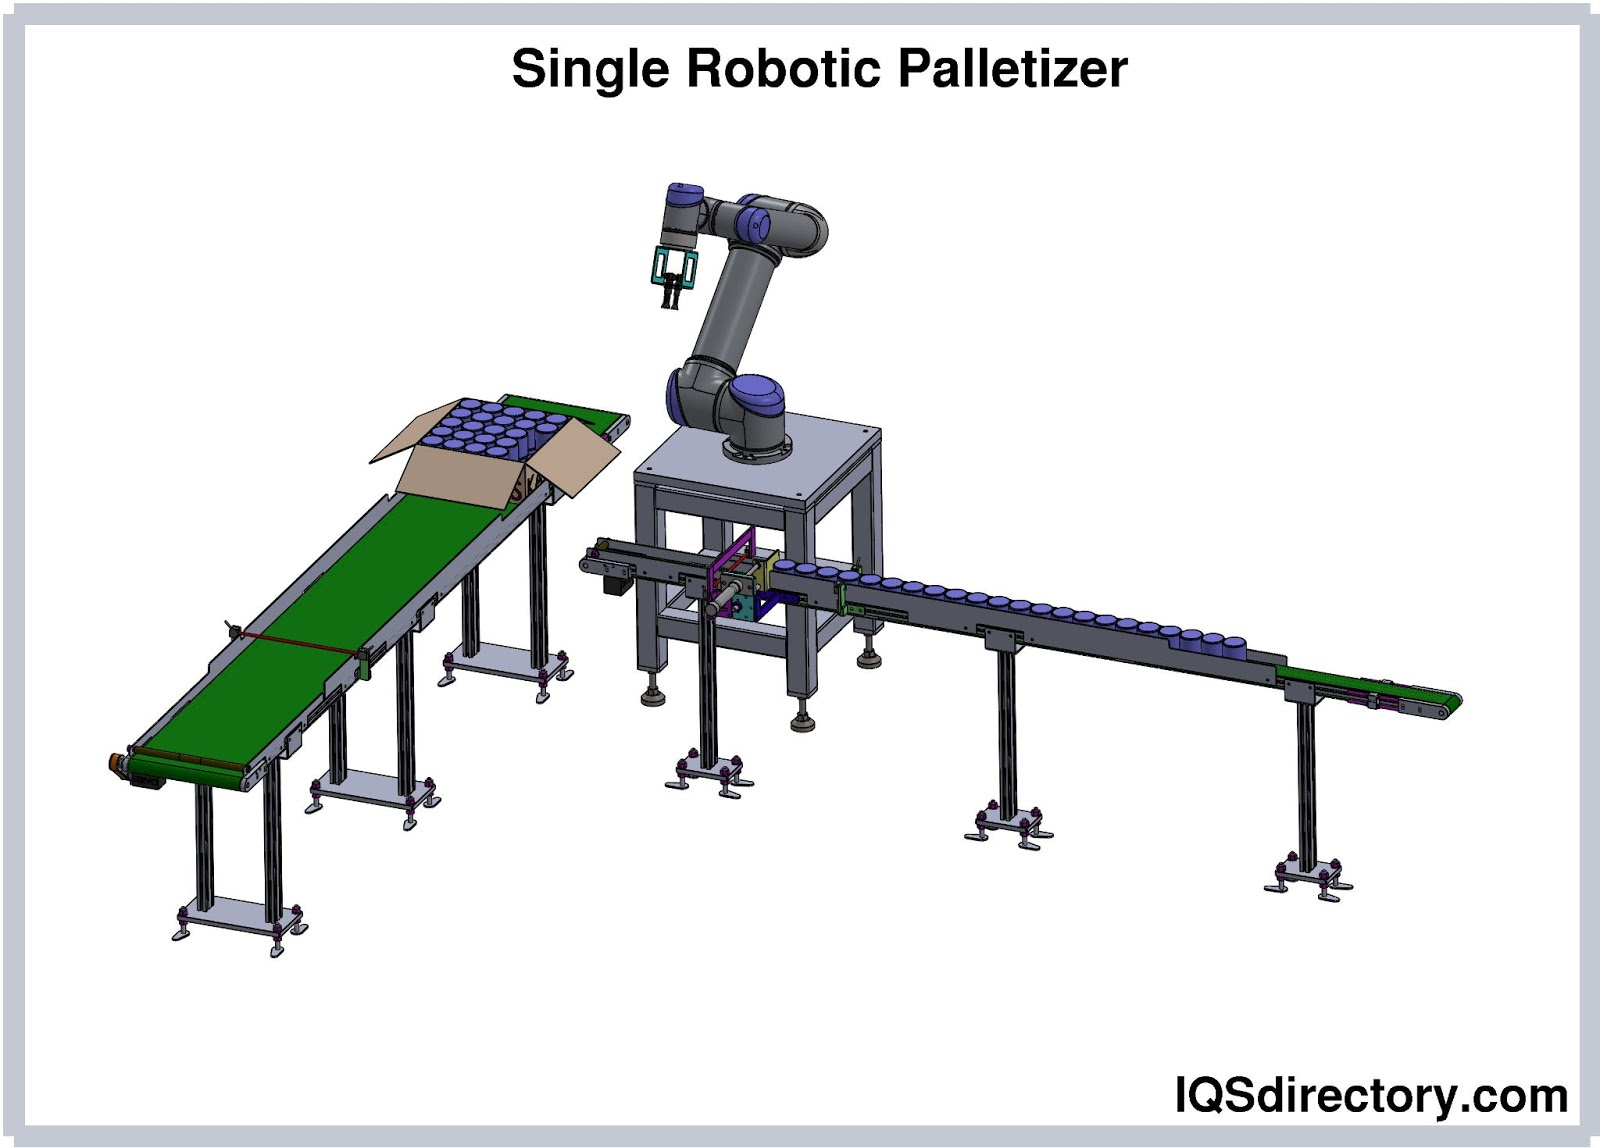 Single Robotic Palletizer